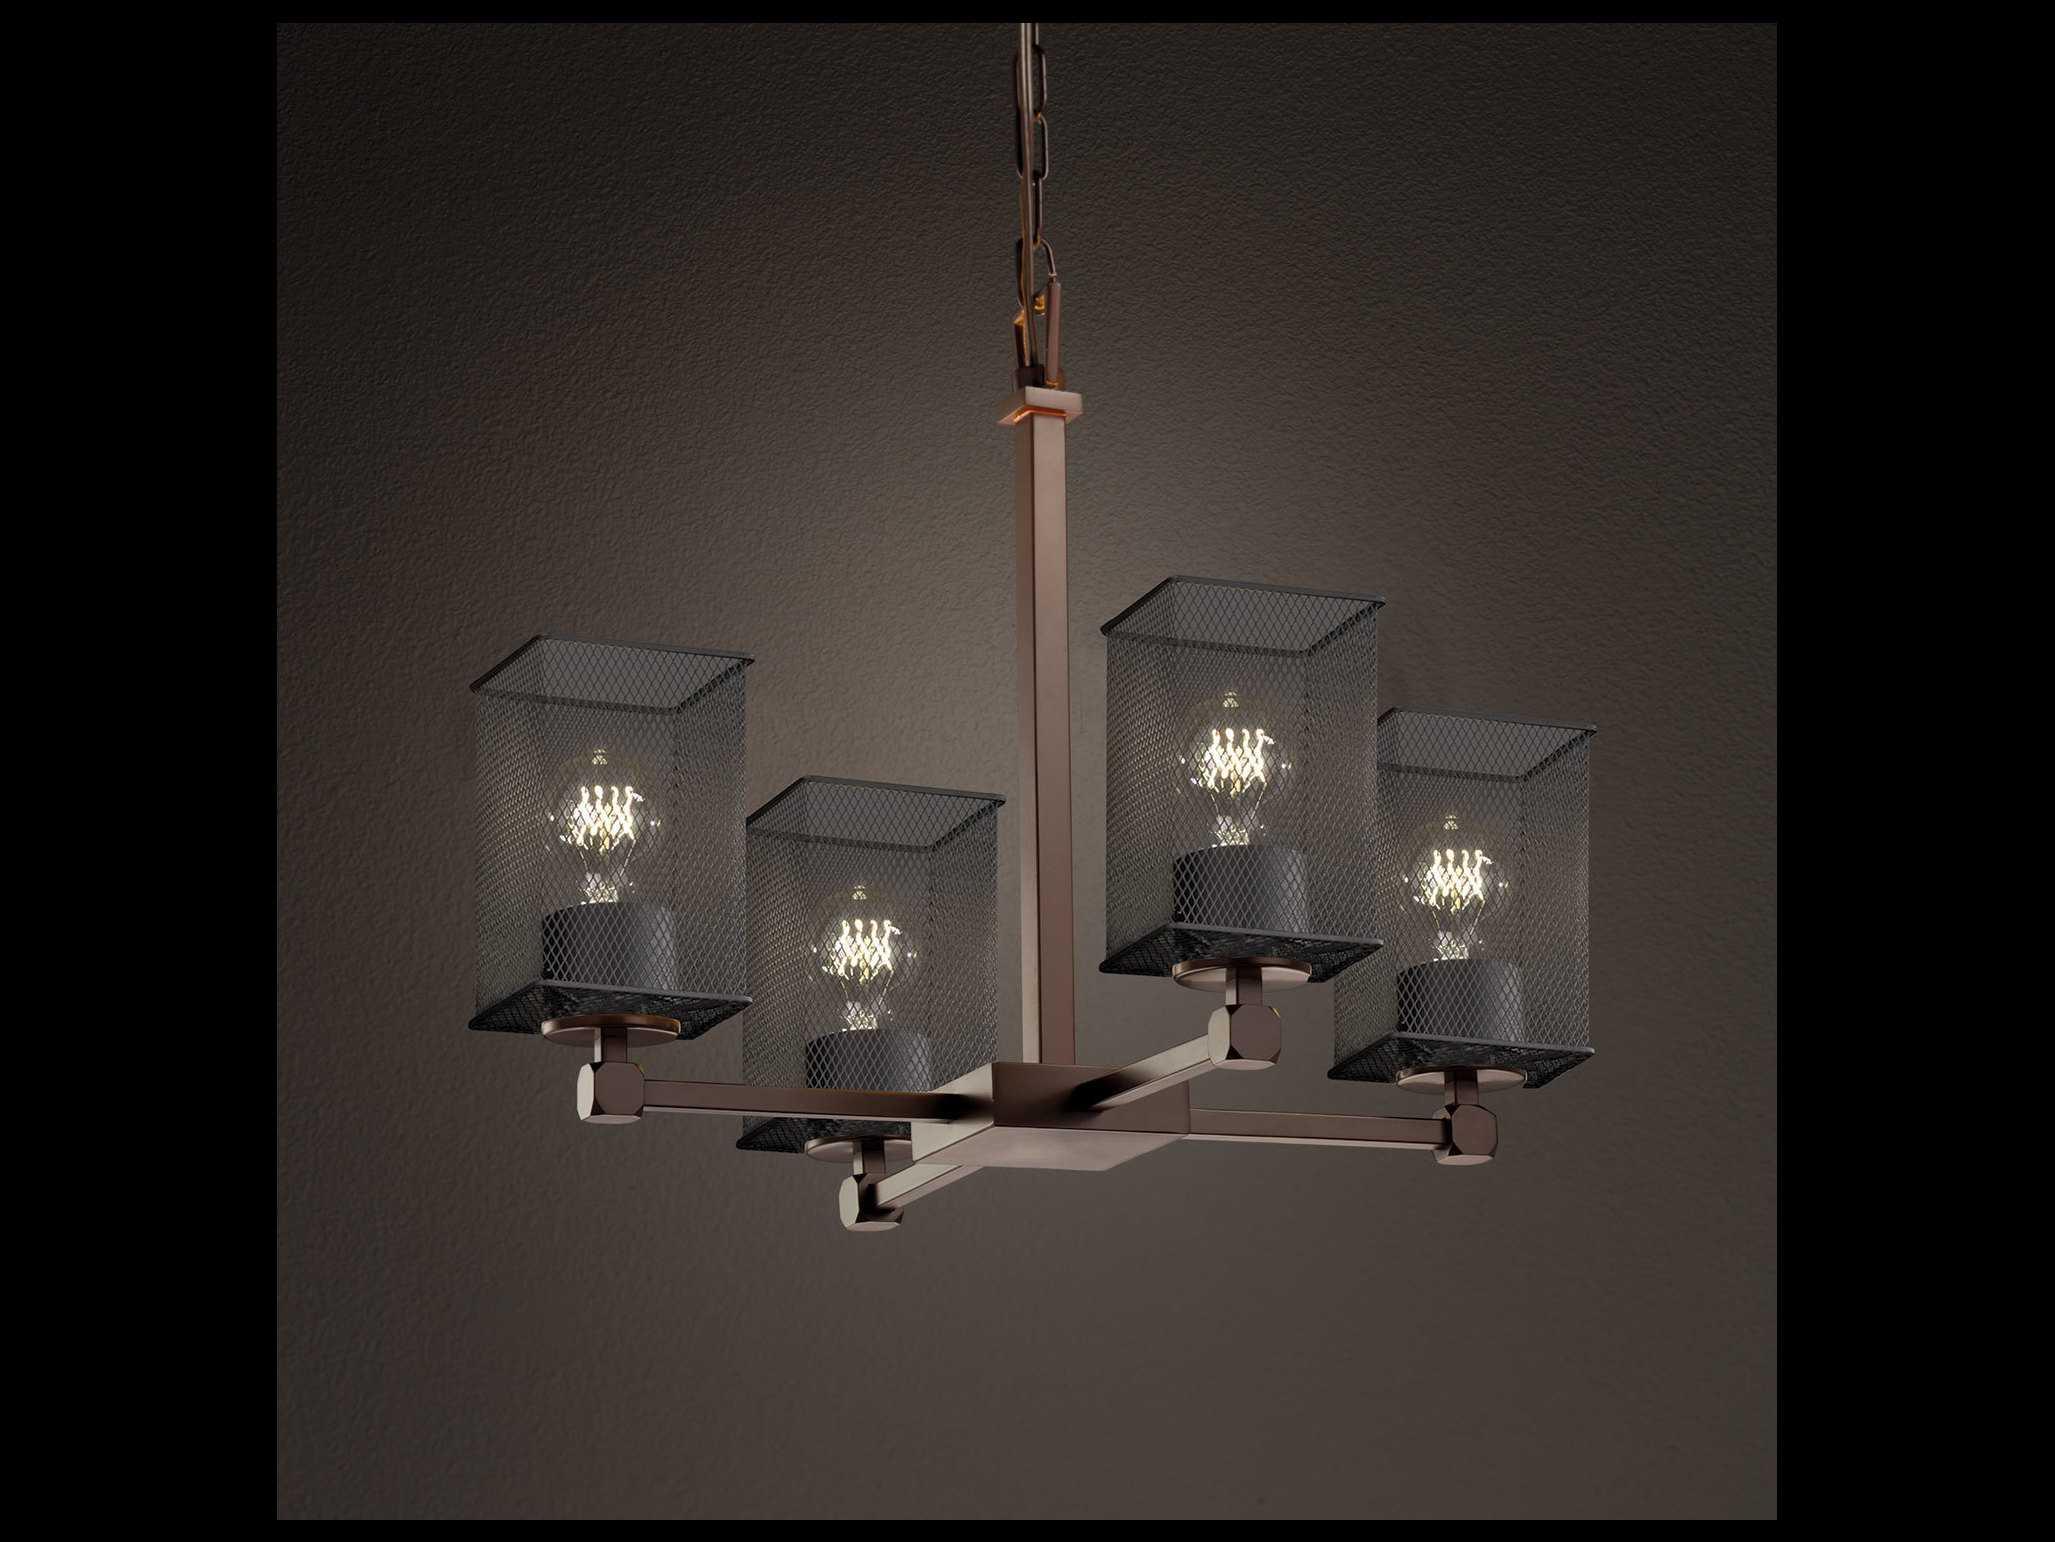 Wiring A 5 Light Chandelier